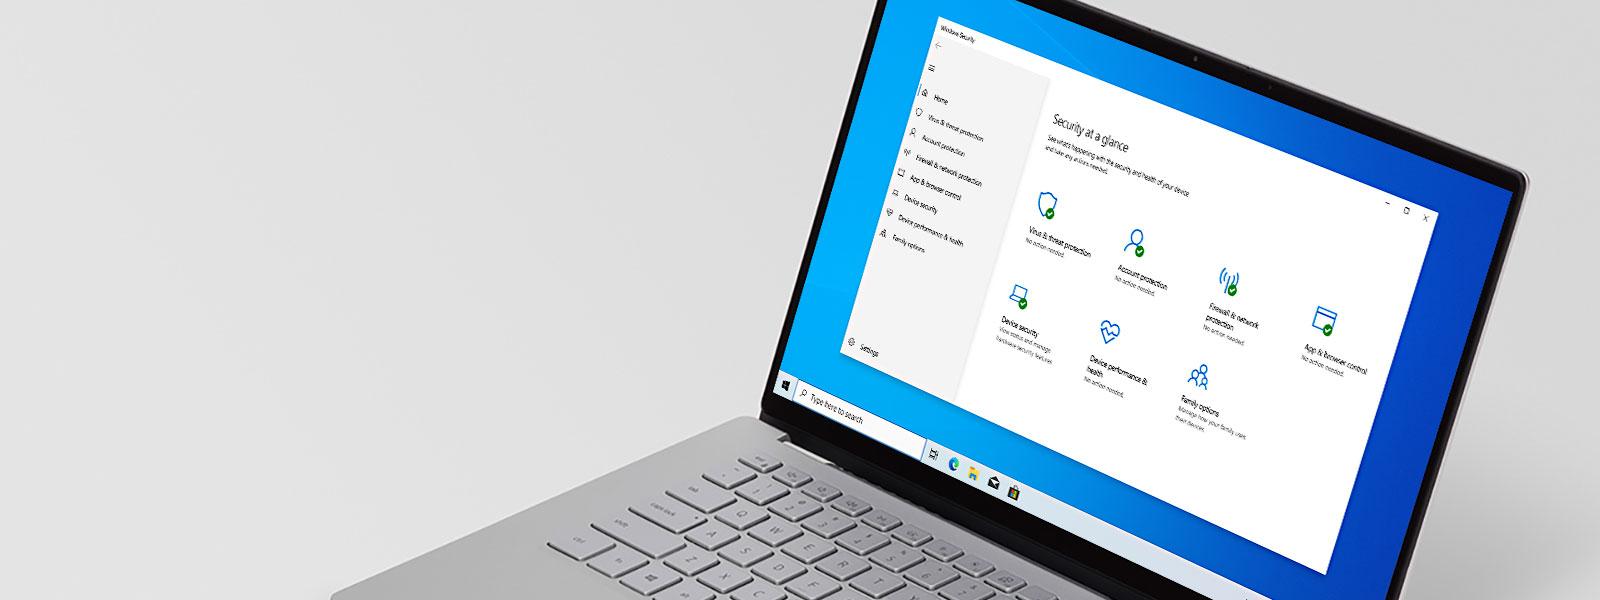 Portátil Windows 10 que muestra la ventana Antivirus de Microsoft Defender